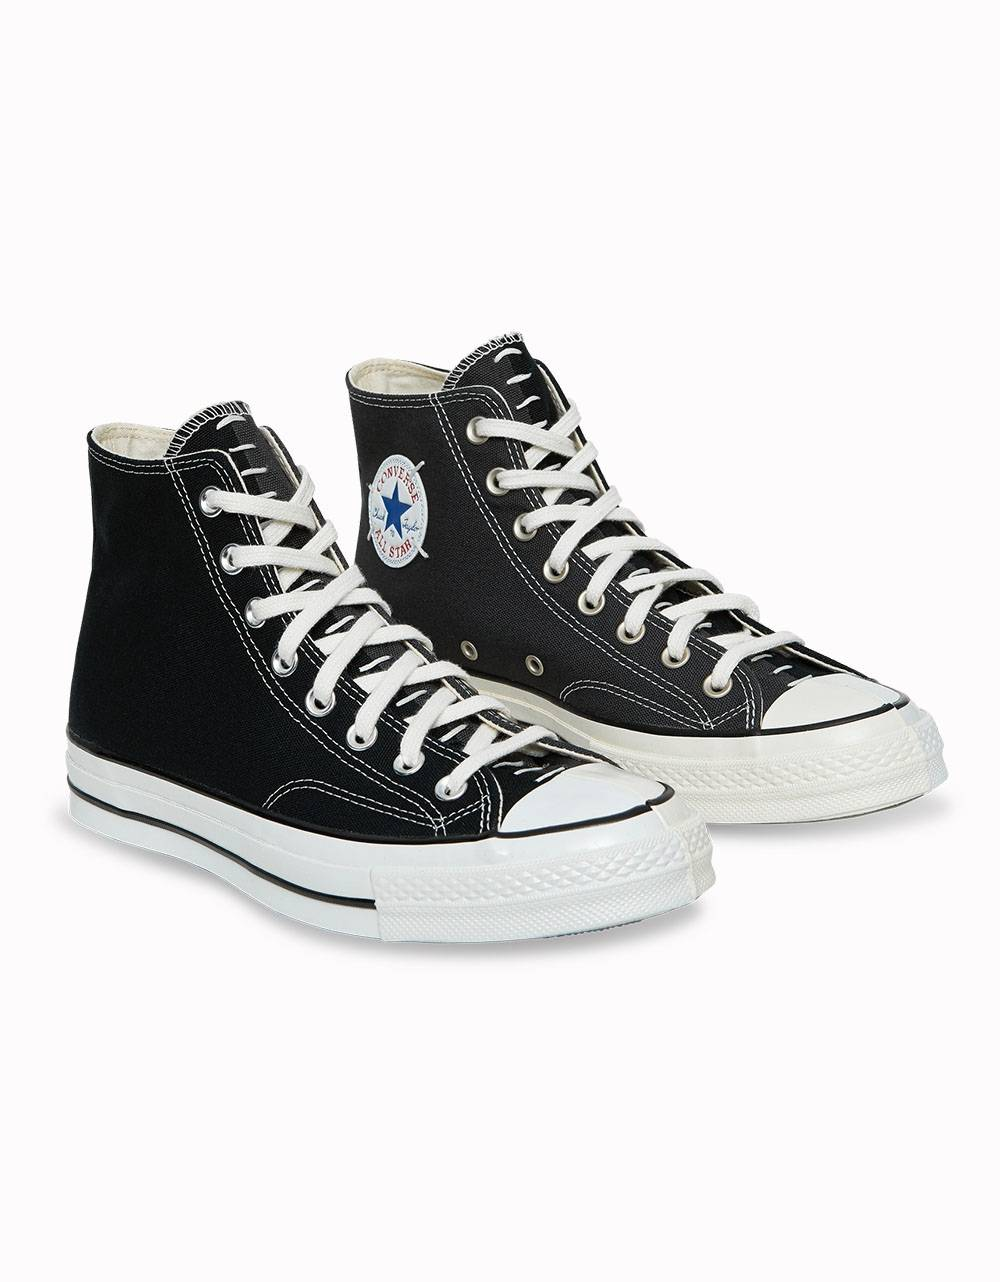 Converse Woman Chuck Taylor 70 Recostructed High ltd - black/almost black/egret Converse Sneakers 142,00€